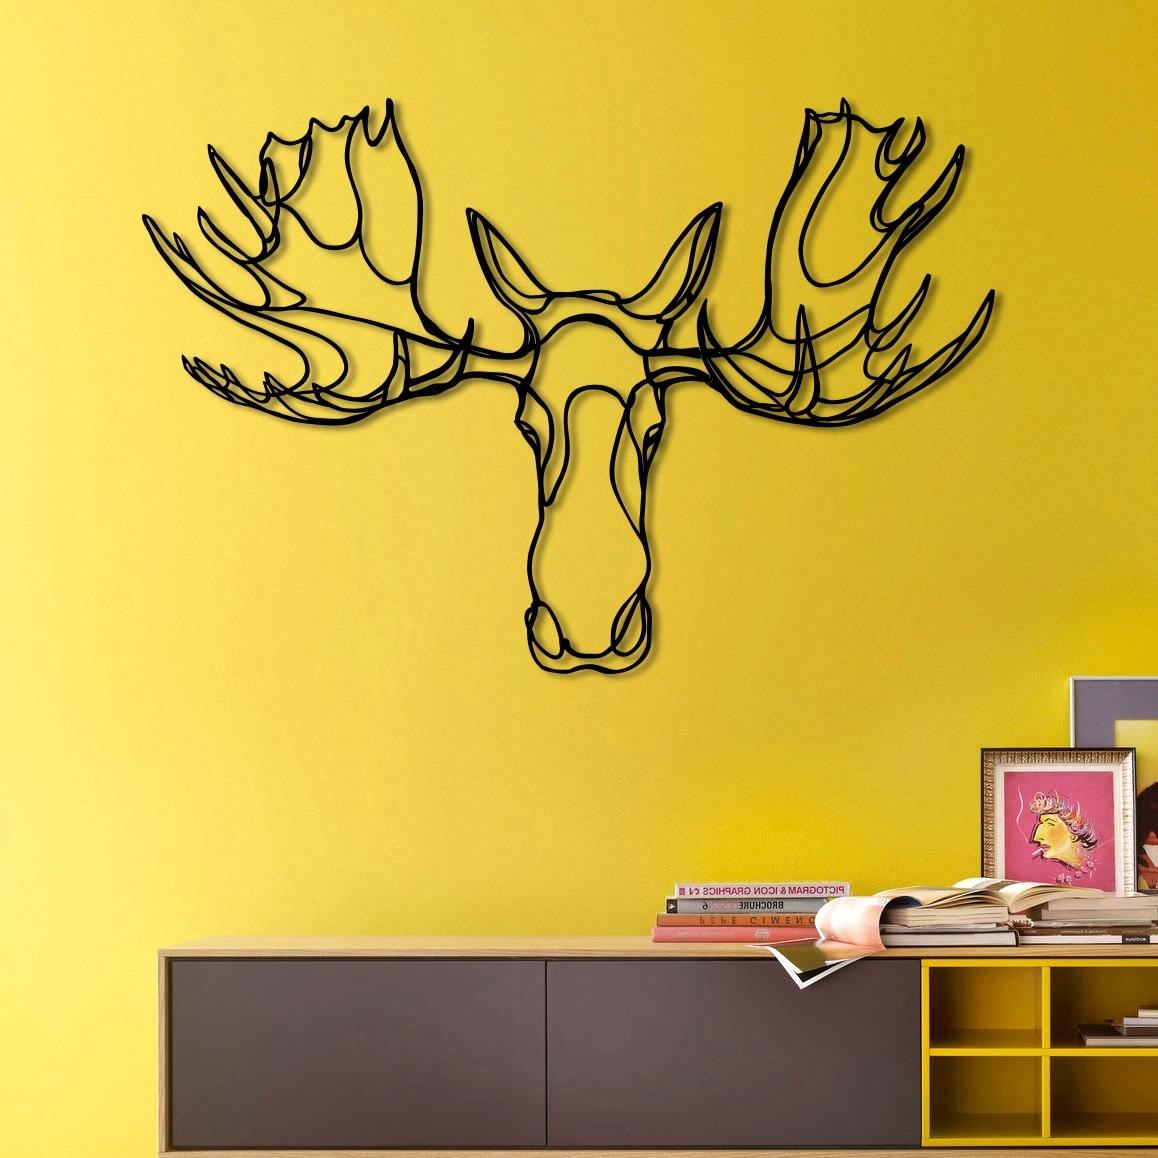 Fine Wall Art Deer Contemporary - The Wall Art Decorations ...